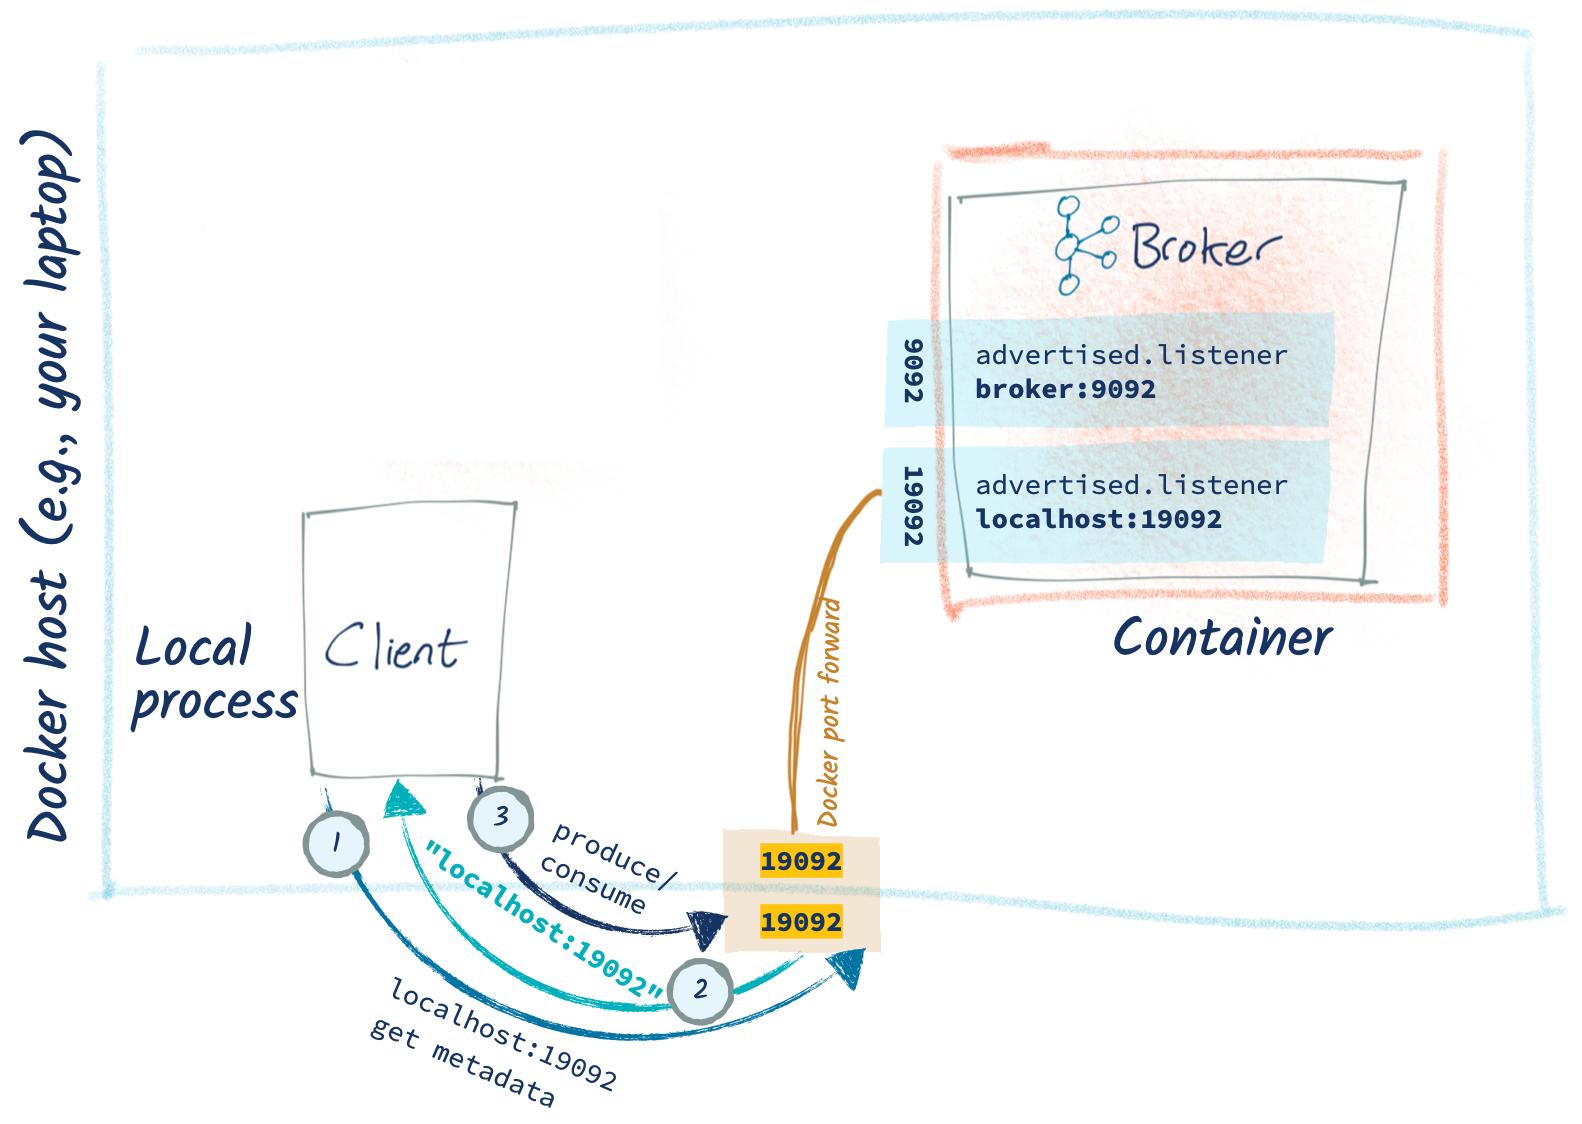 Docker host (e.g., your laptop) – Local process: Client – `produce/consume` | Docker port forward – Container: Kafka broker